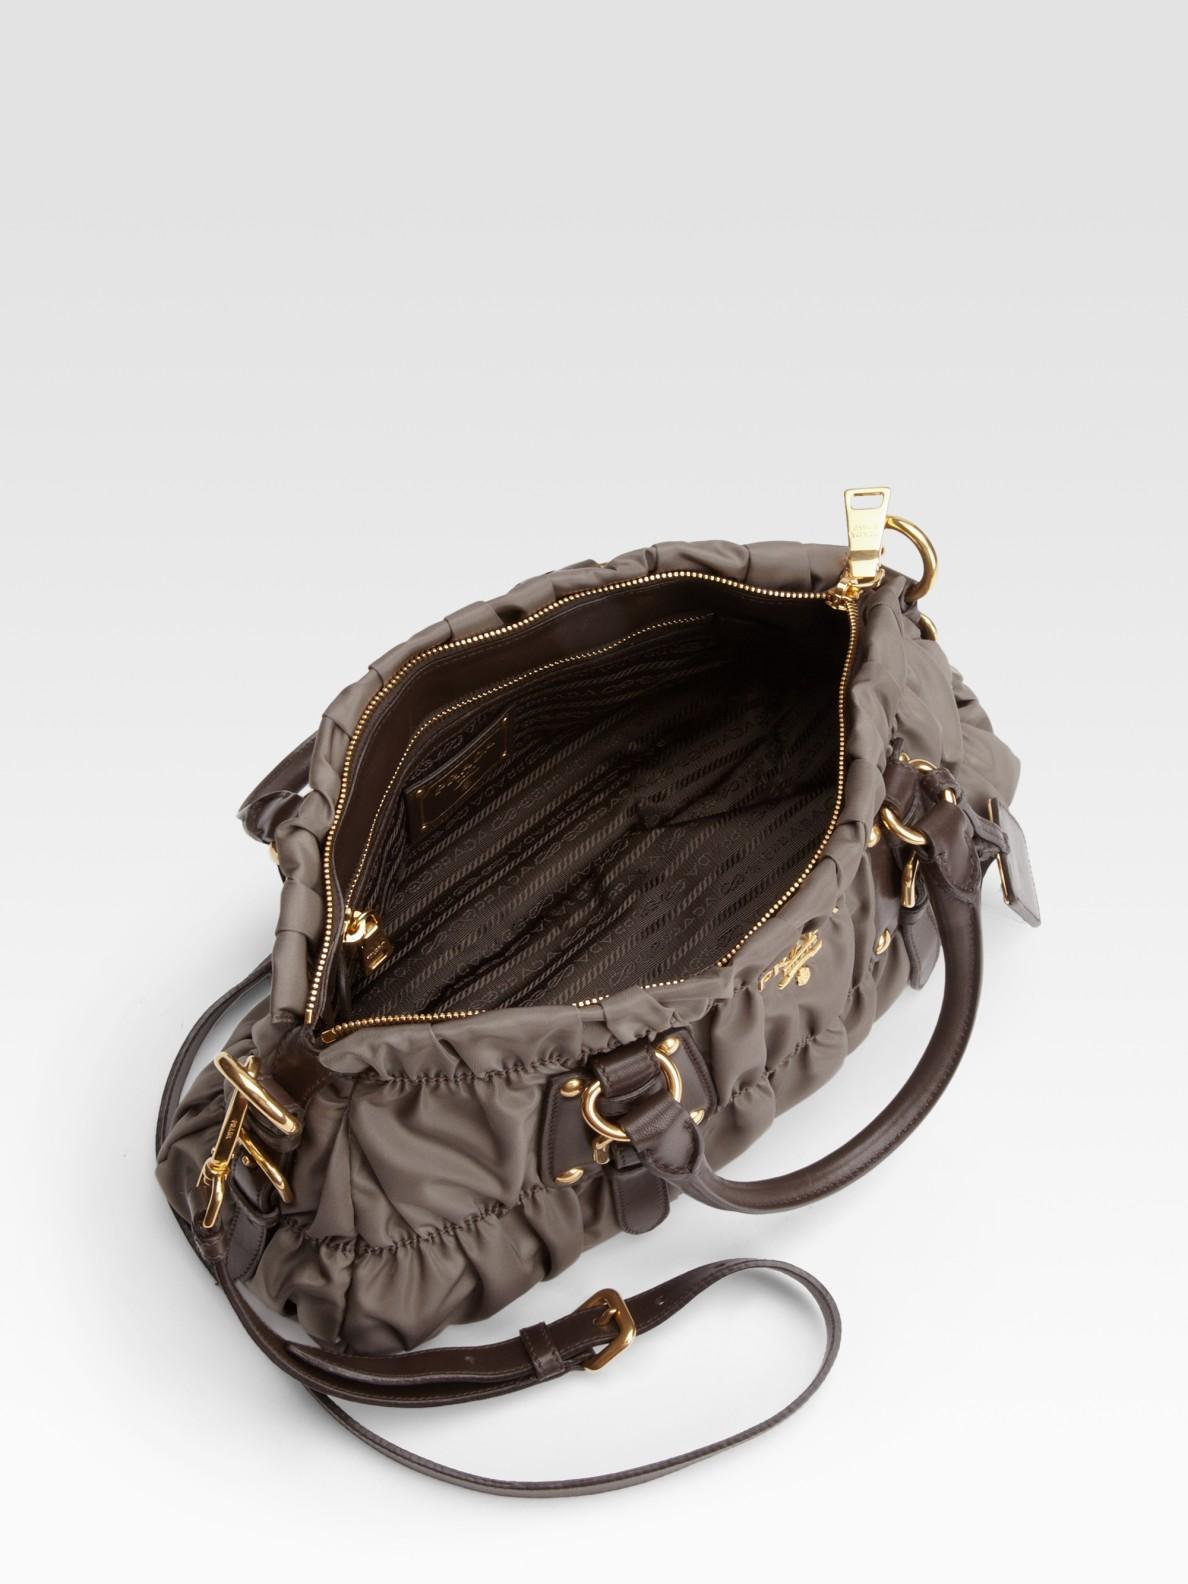 prada black and white handbag - Prada Tessuto Gaufre Nylon Satchel in Gray (grey) | Lyst